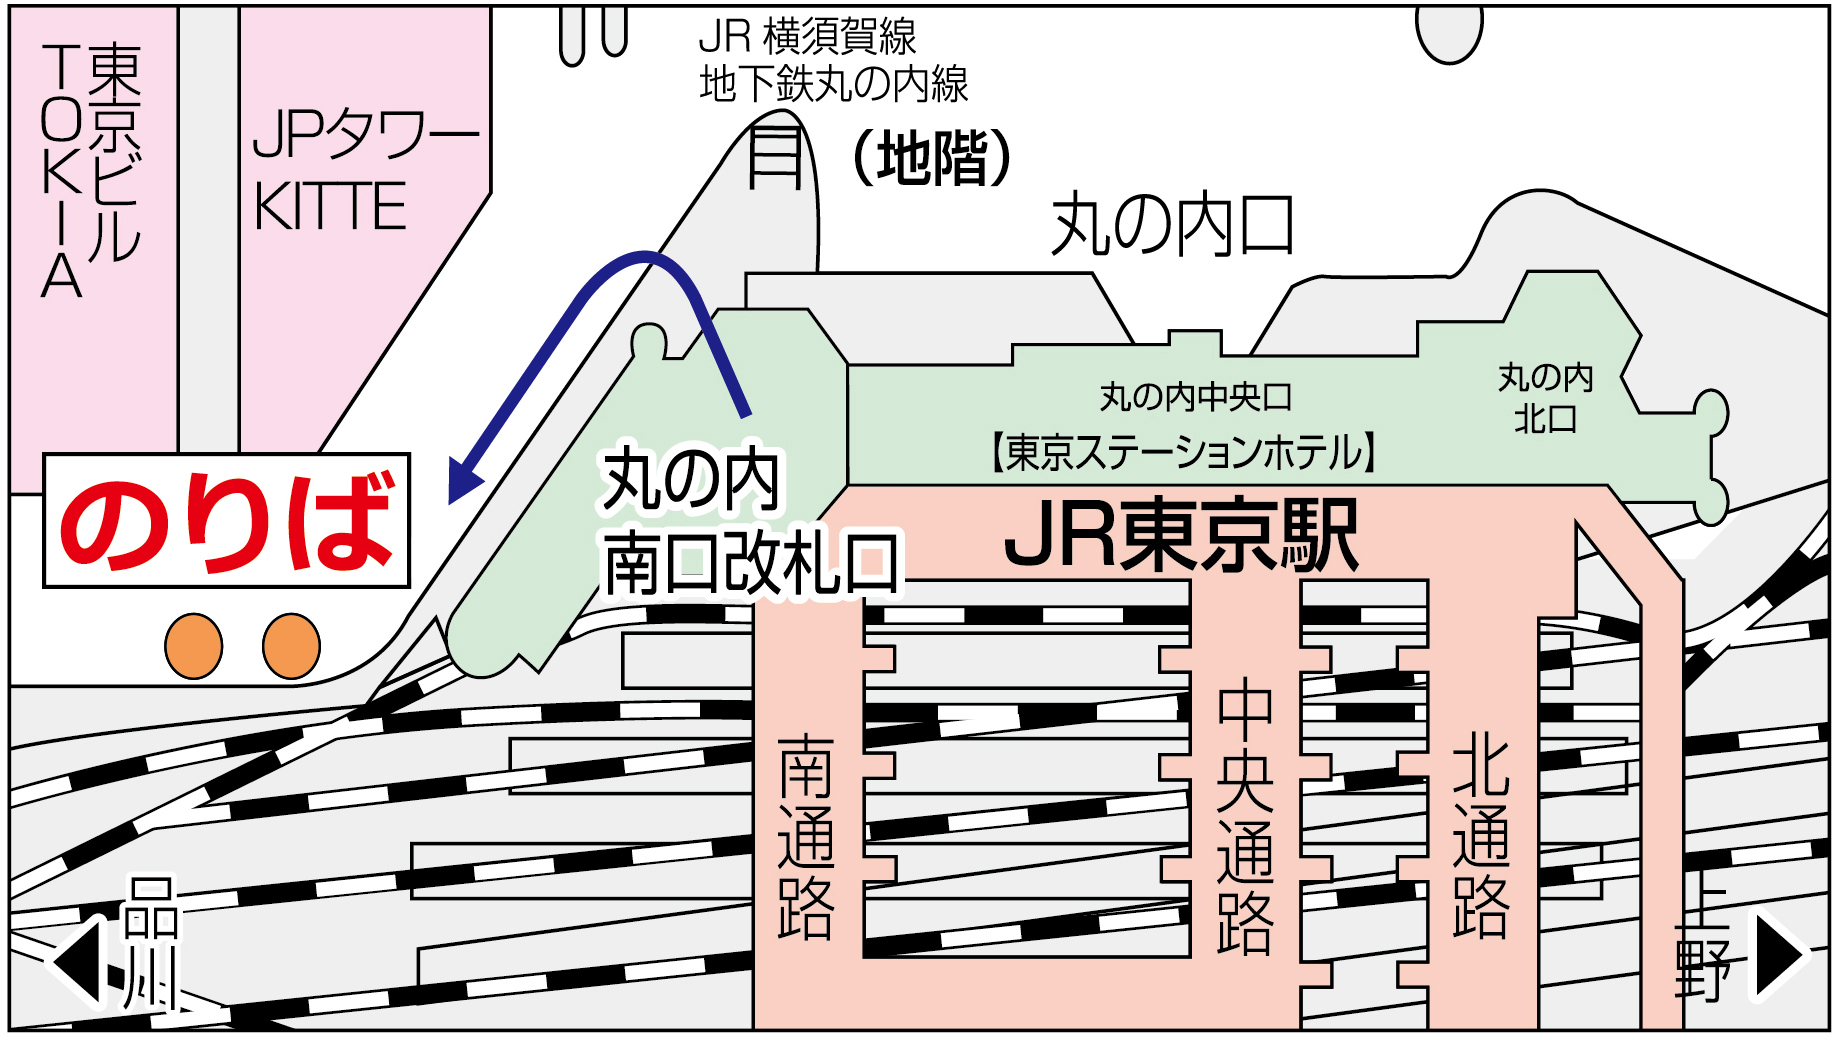 東京駅バス停位置地図